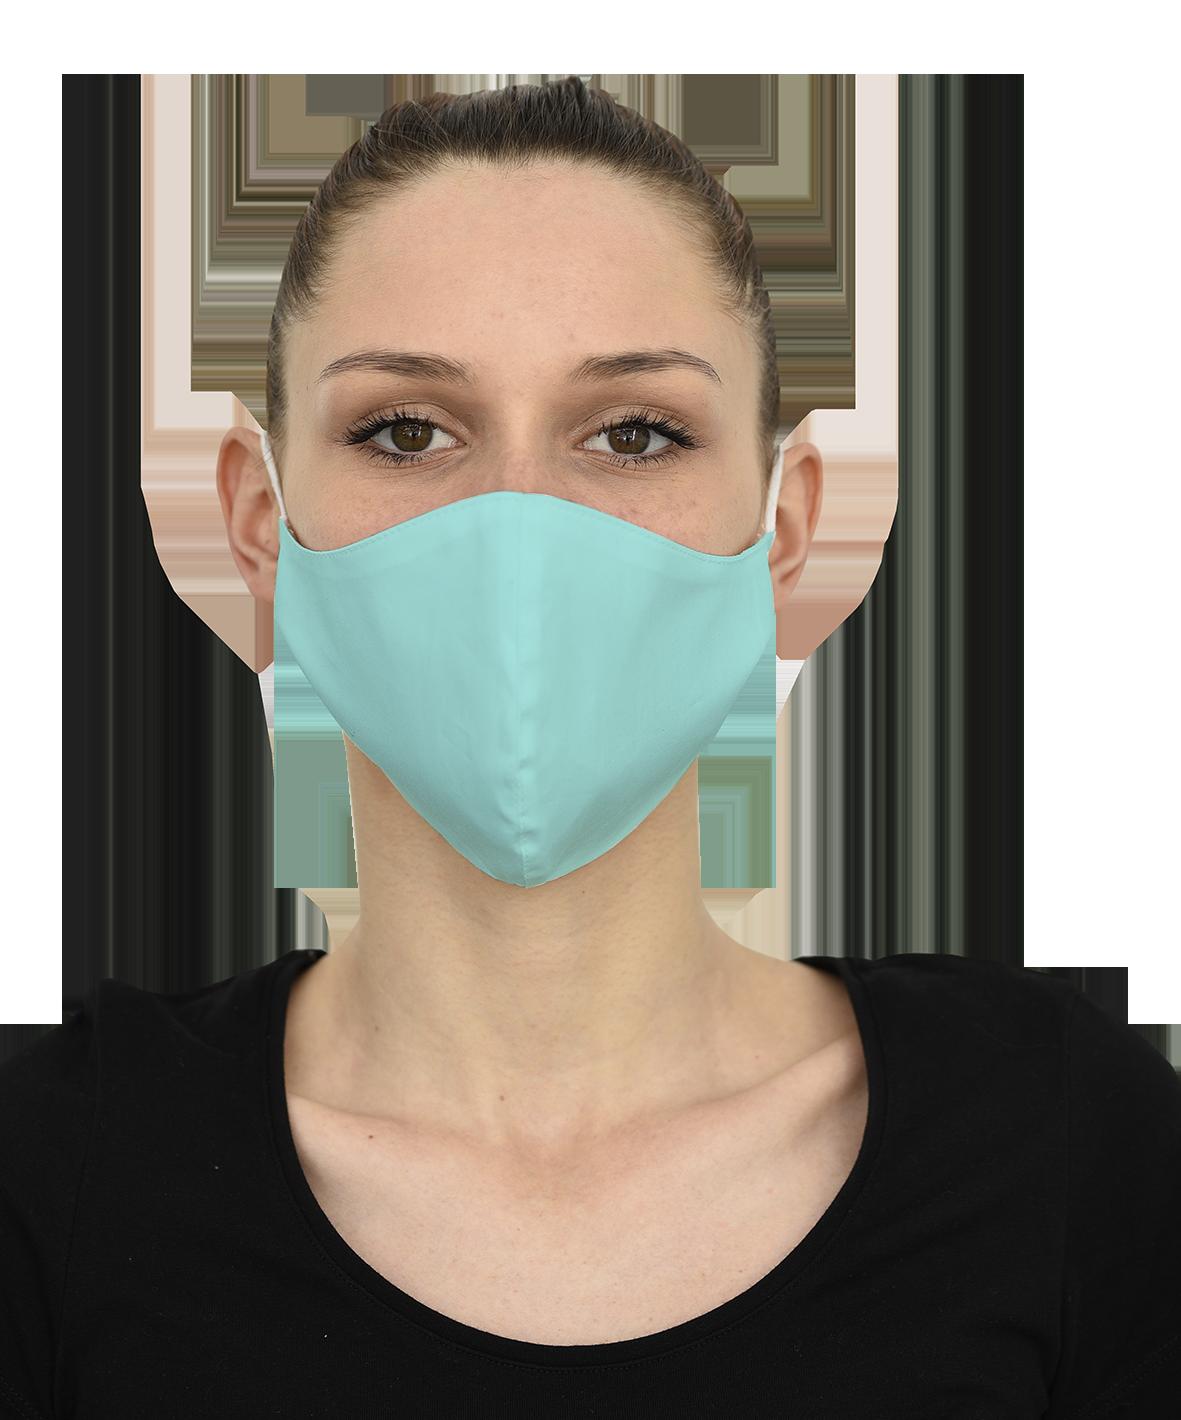 Mască Turquoise - 29 LEI |  PRINTCENTER - Tipar digital, offset, indoor, outdoor